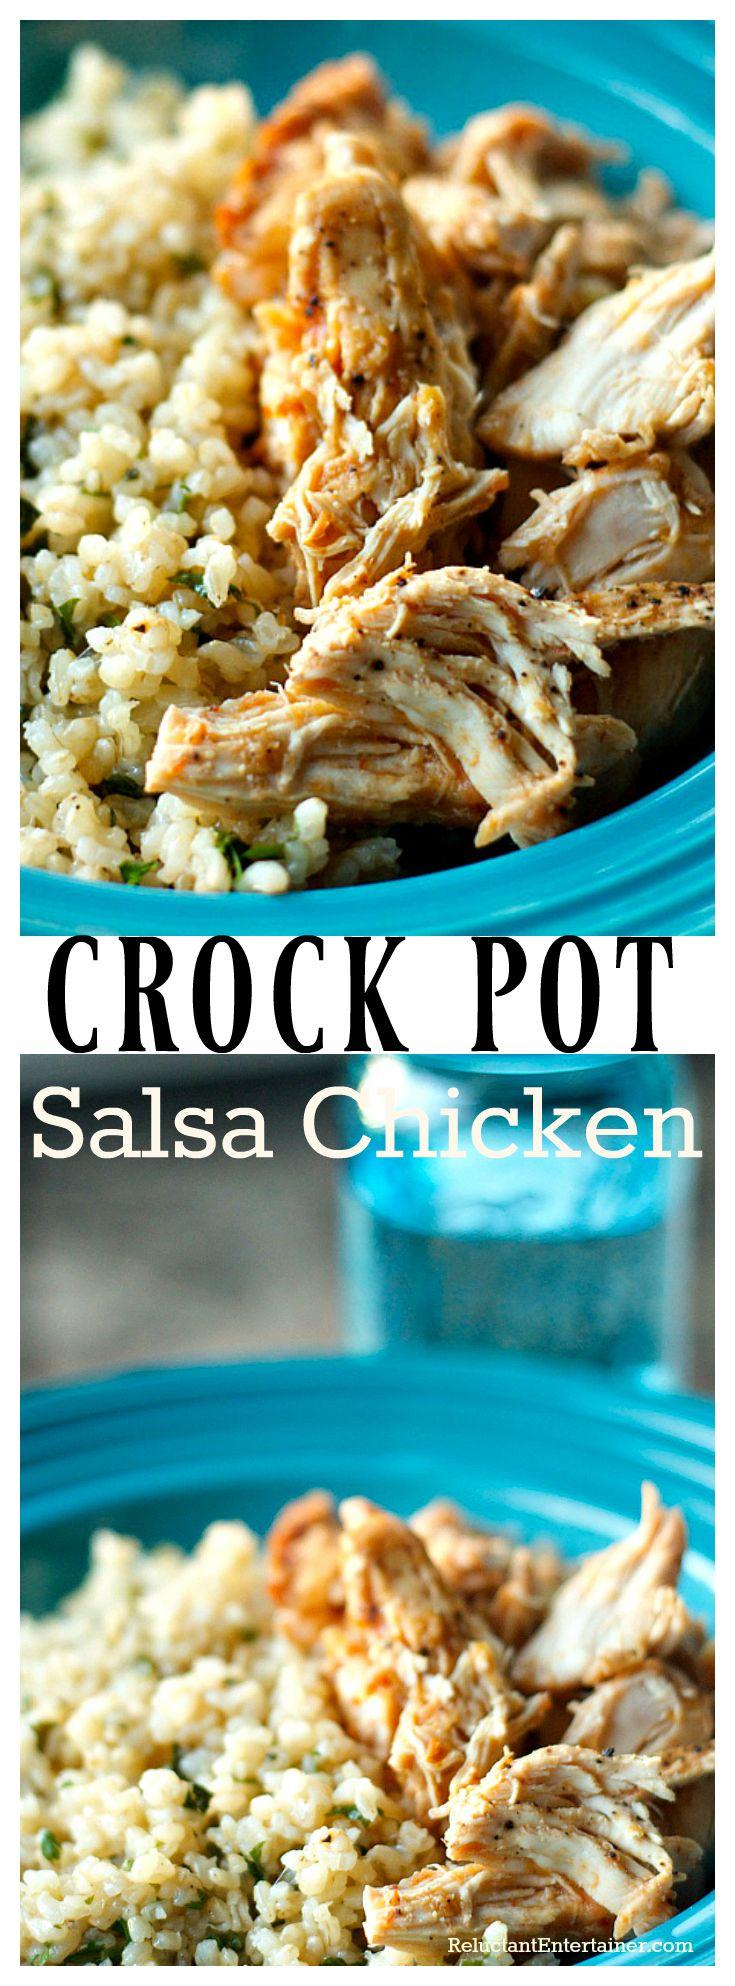 Crock Pot Salsa Chicken on Brown Rice or for Mexican food - tacos, enchiladas, tostadas.